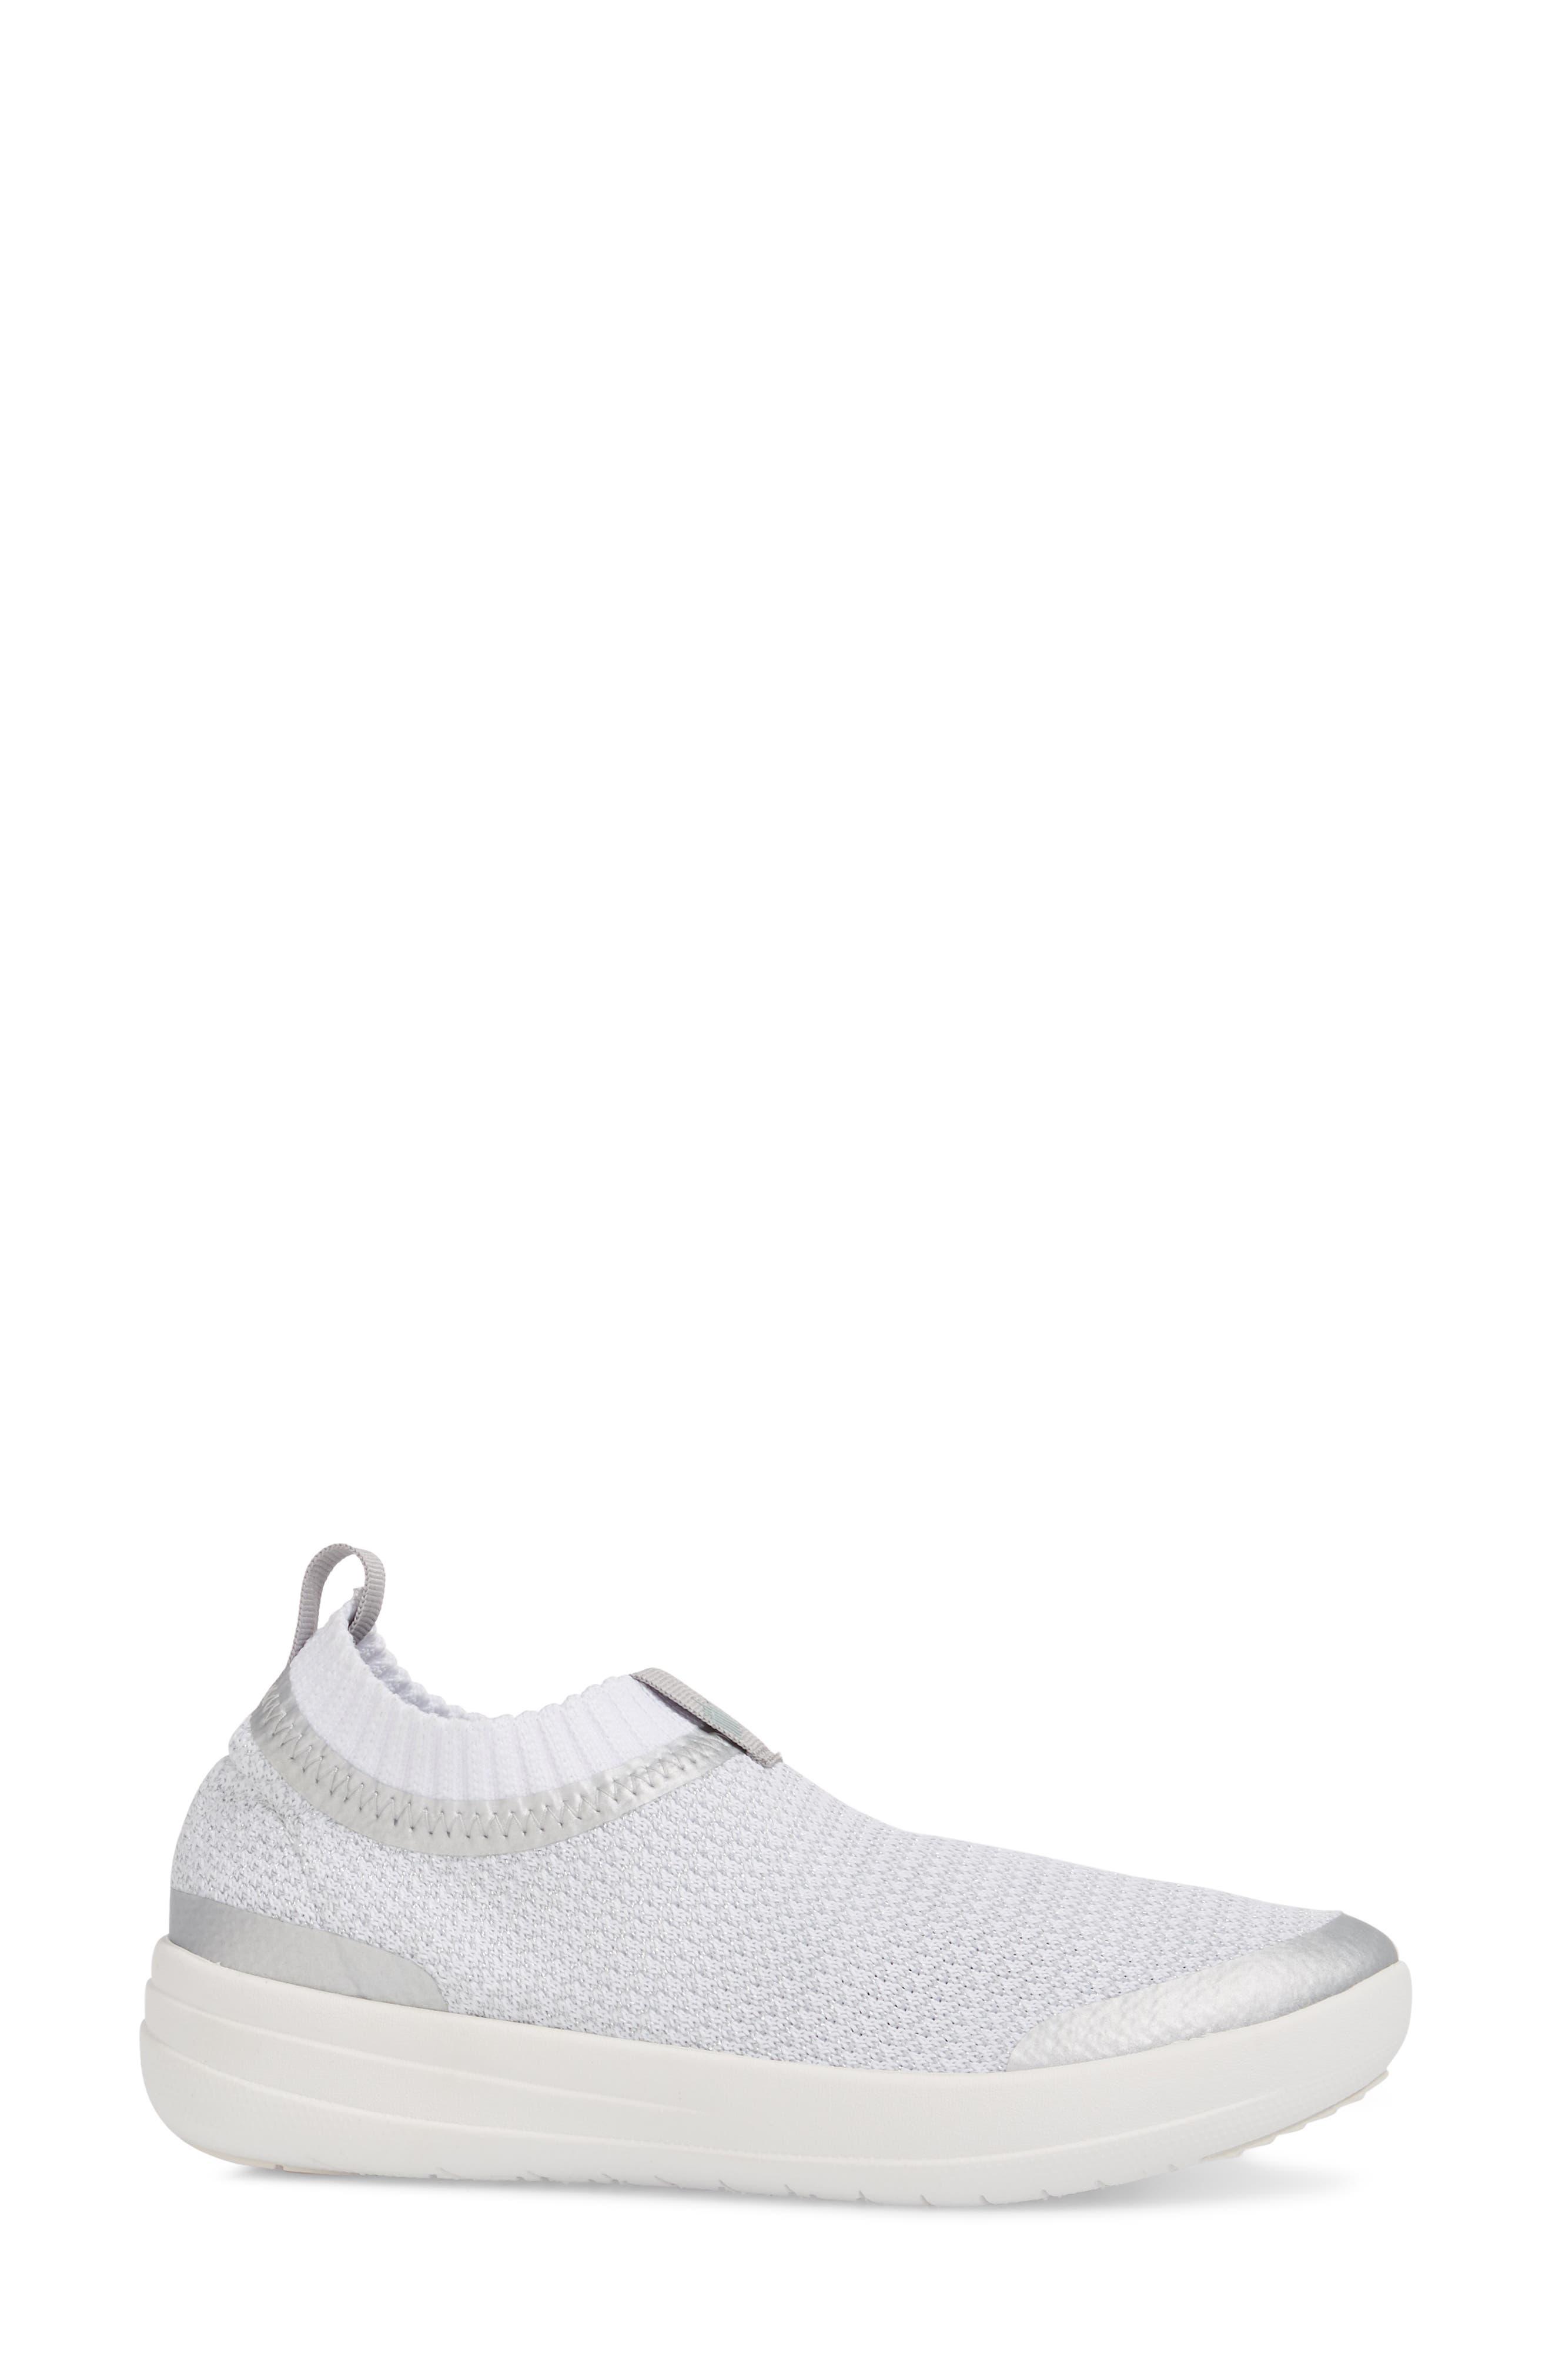 Uberknit Knit Sock Sneaker,                             Alternate thumbnail 3, color,                             040